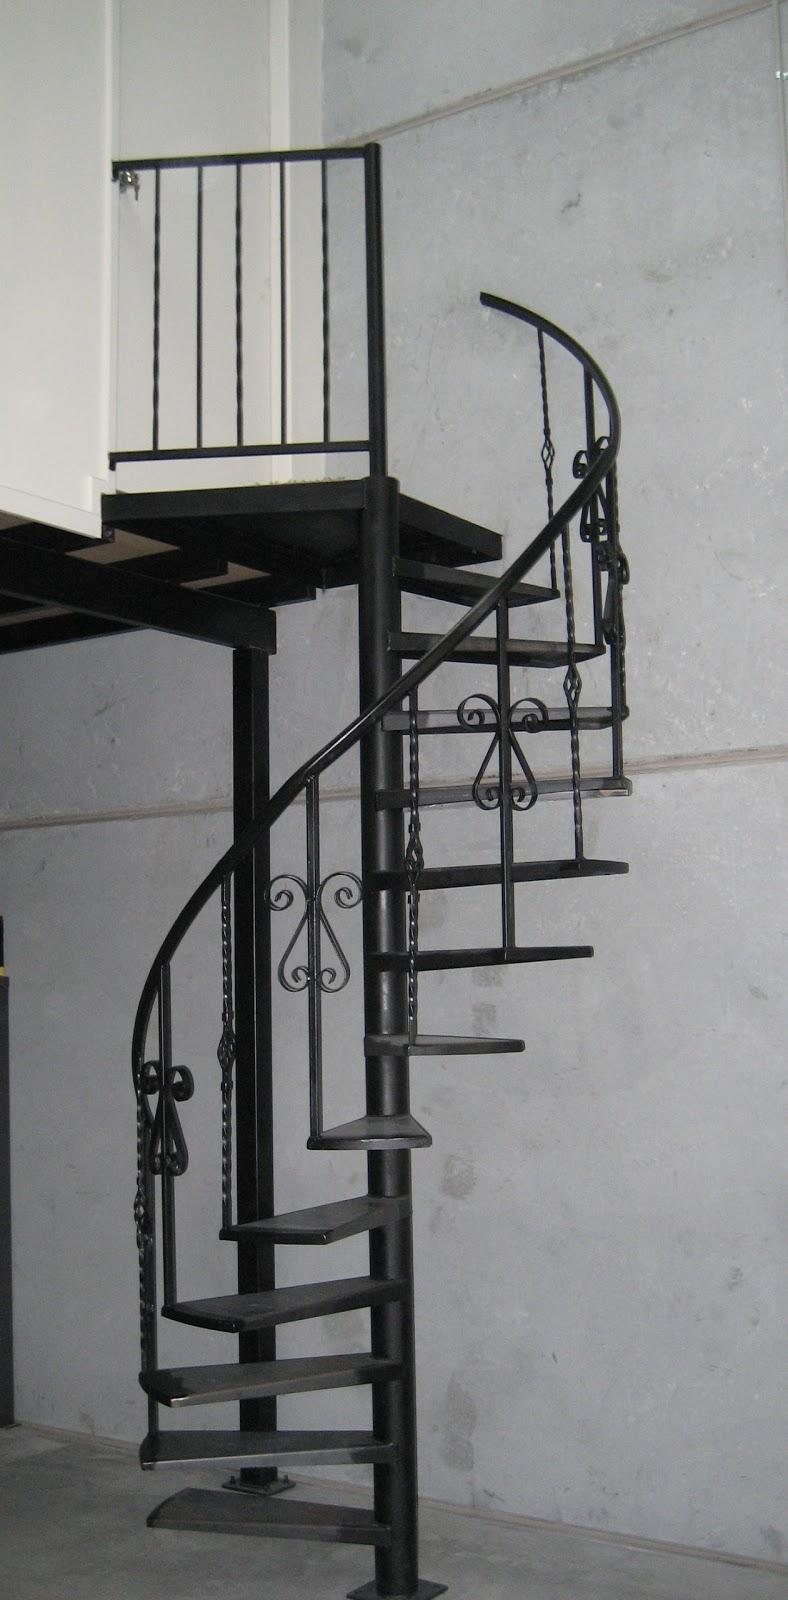 kanopi baja design bengkel las suka hati | menerima pesanan pagar rumah ...